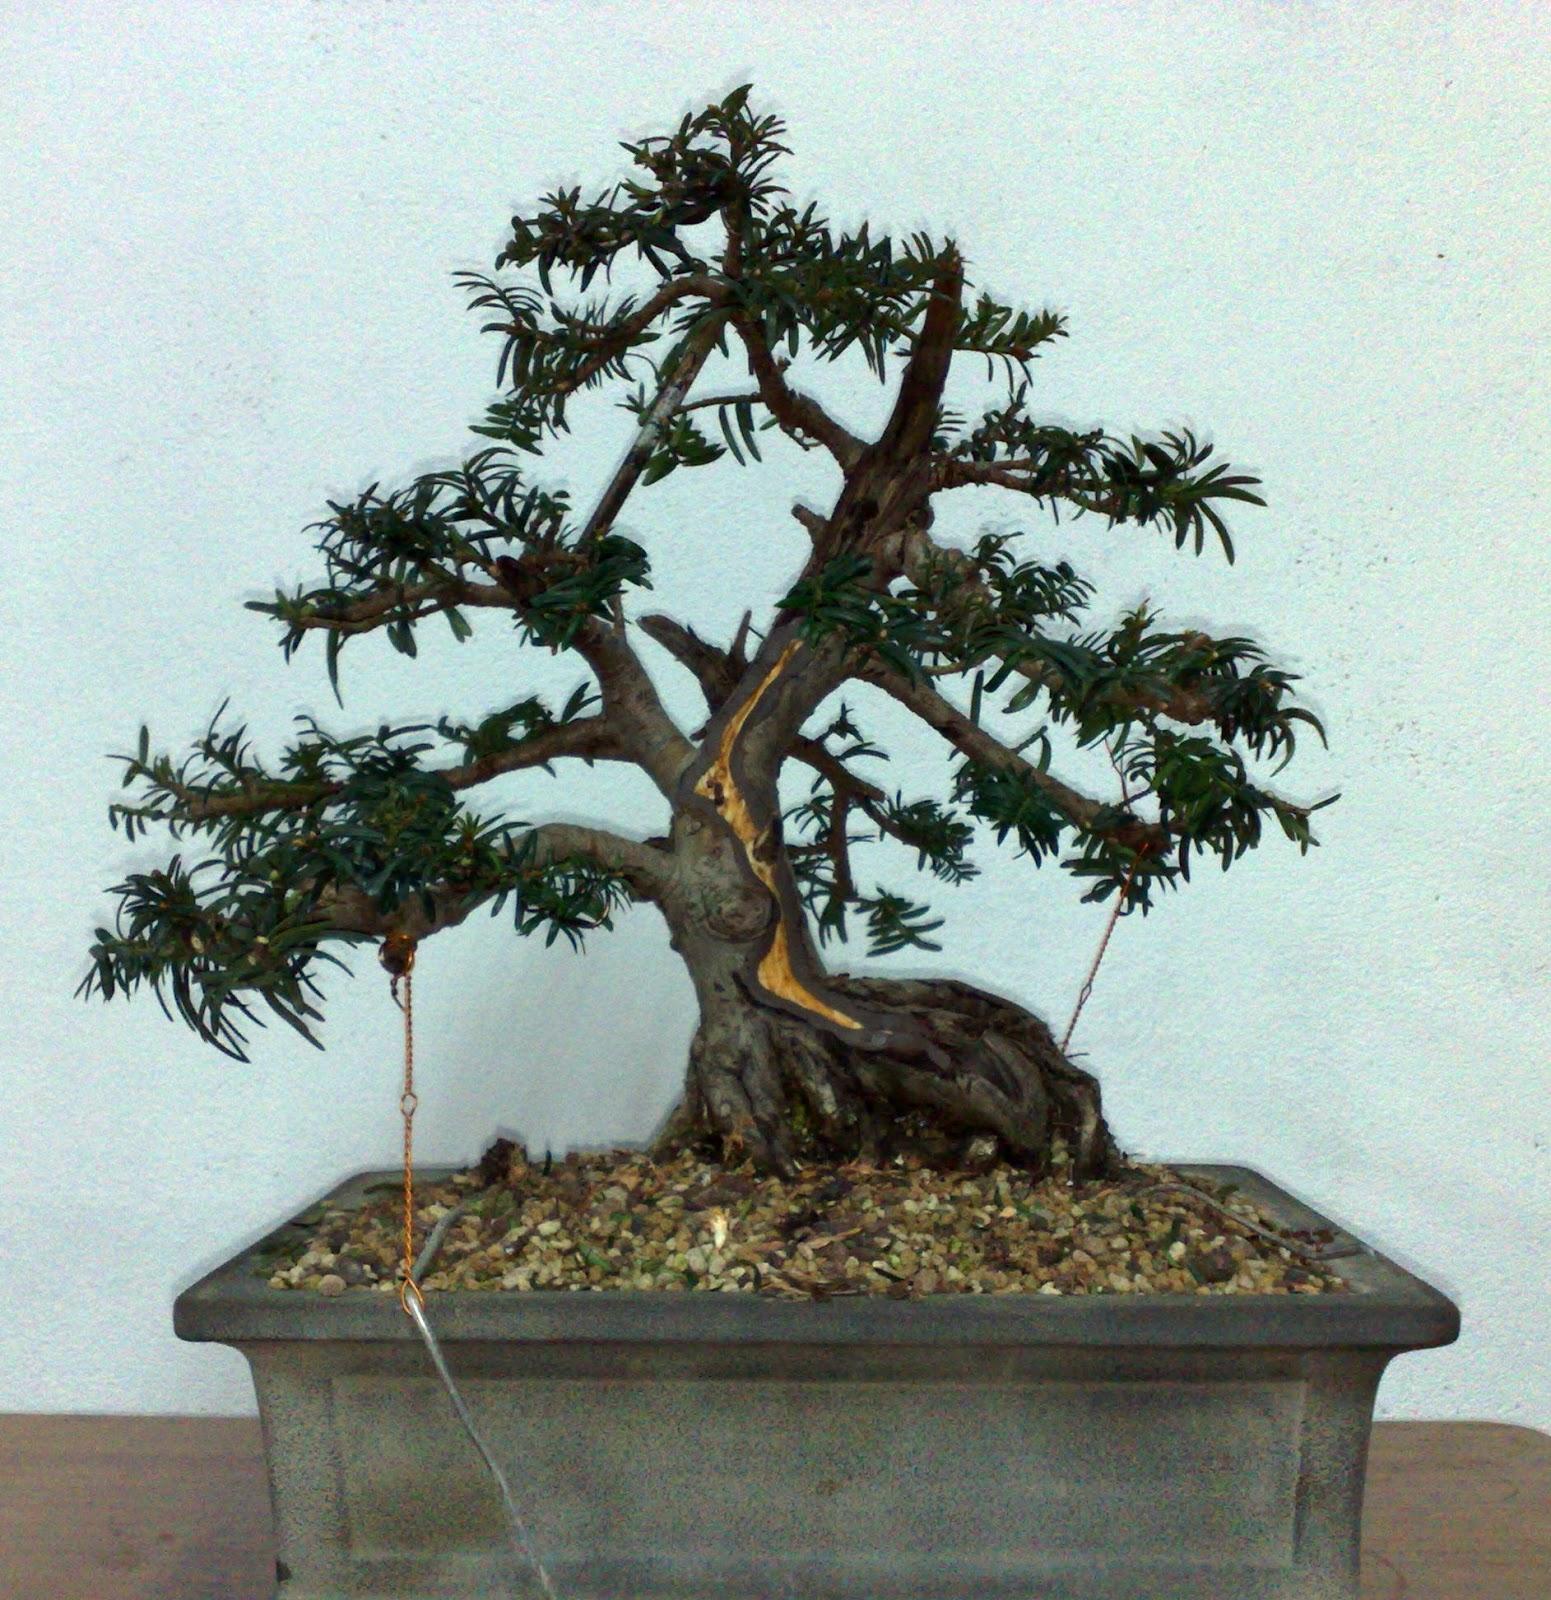 Escuela bonsai valencia diciembre 2012 for Vivero online arboles